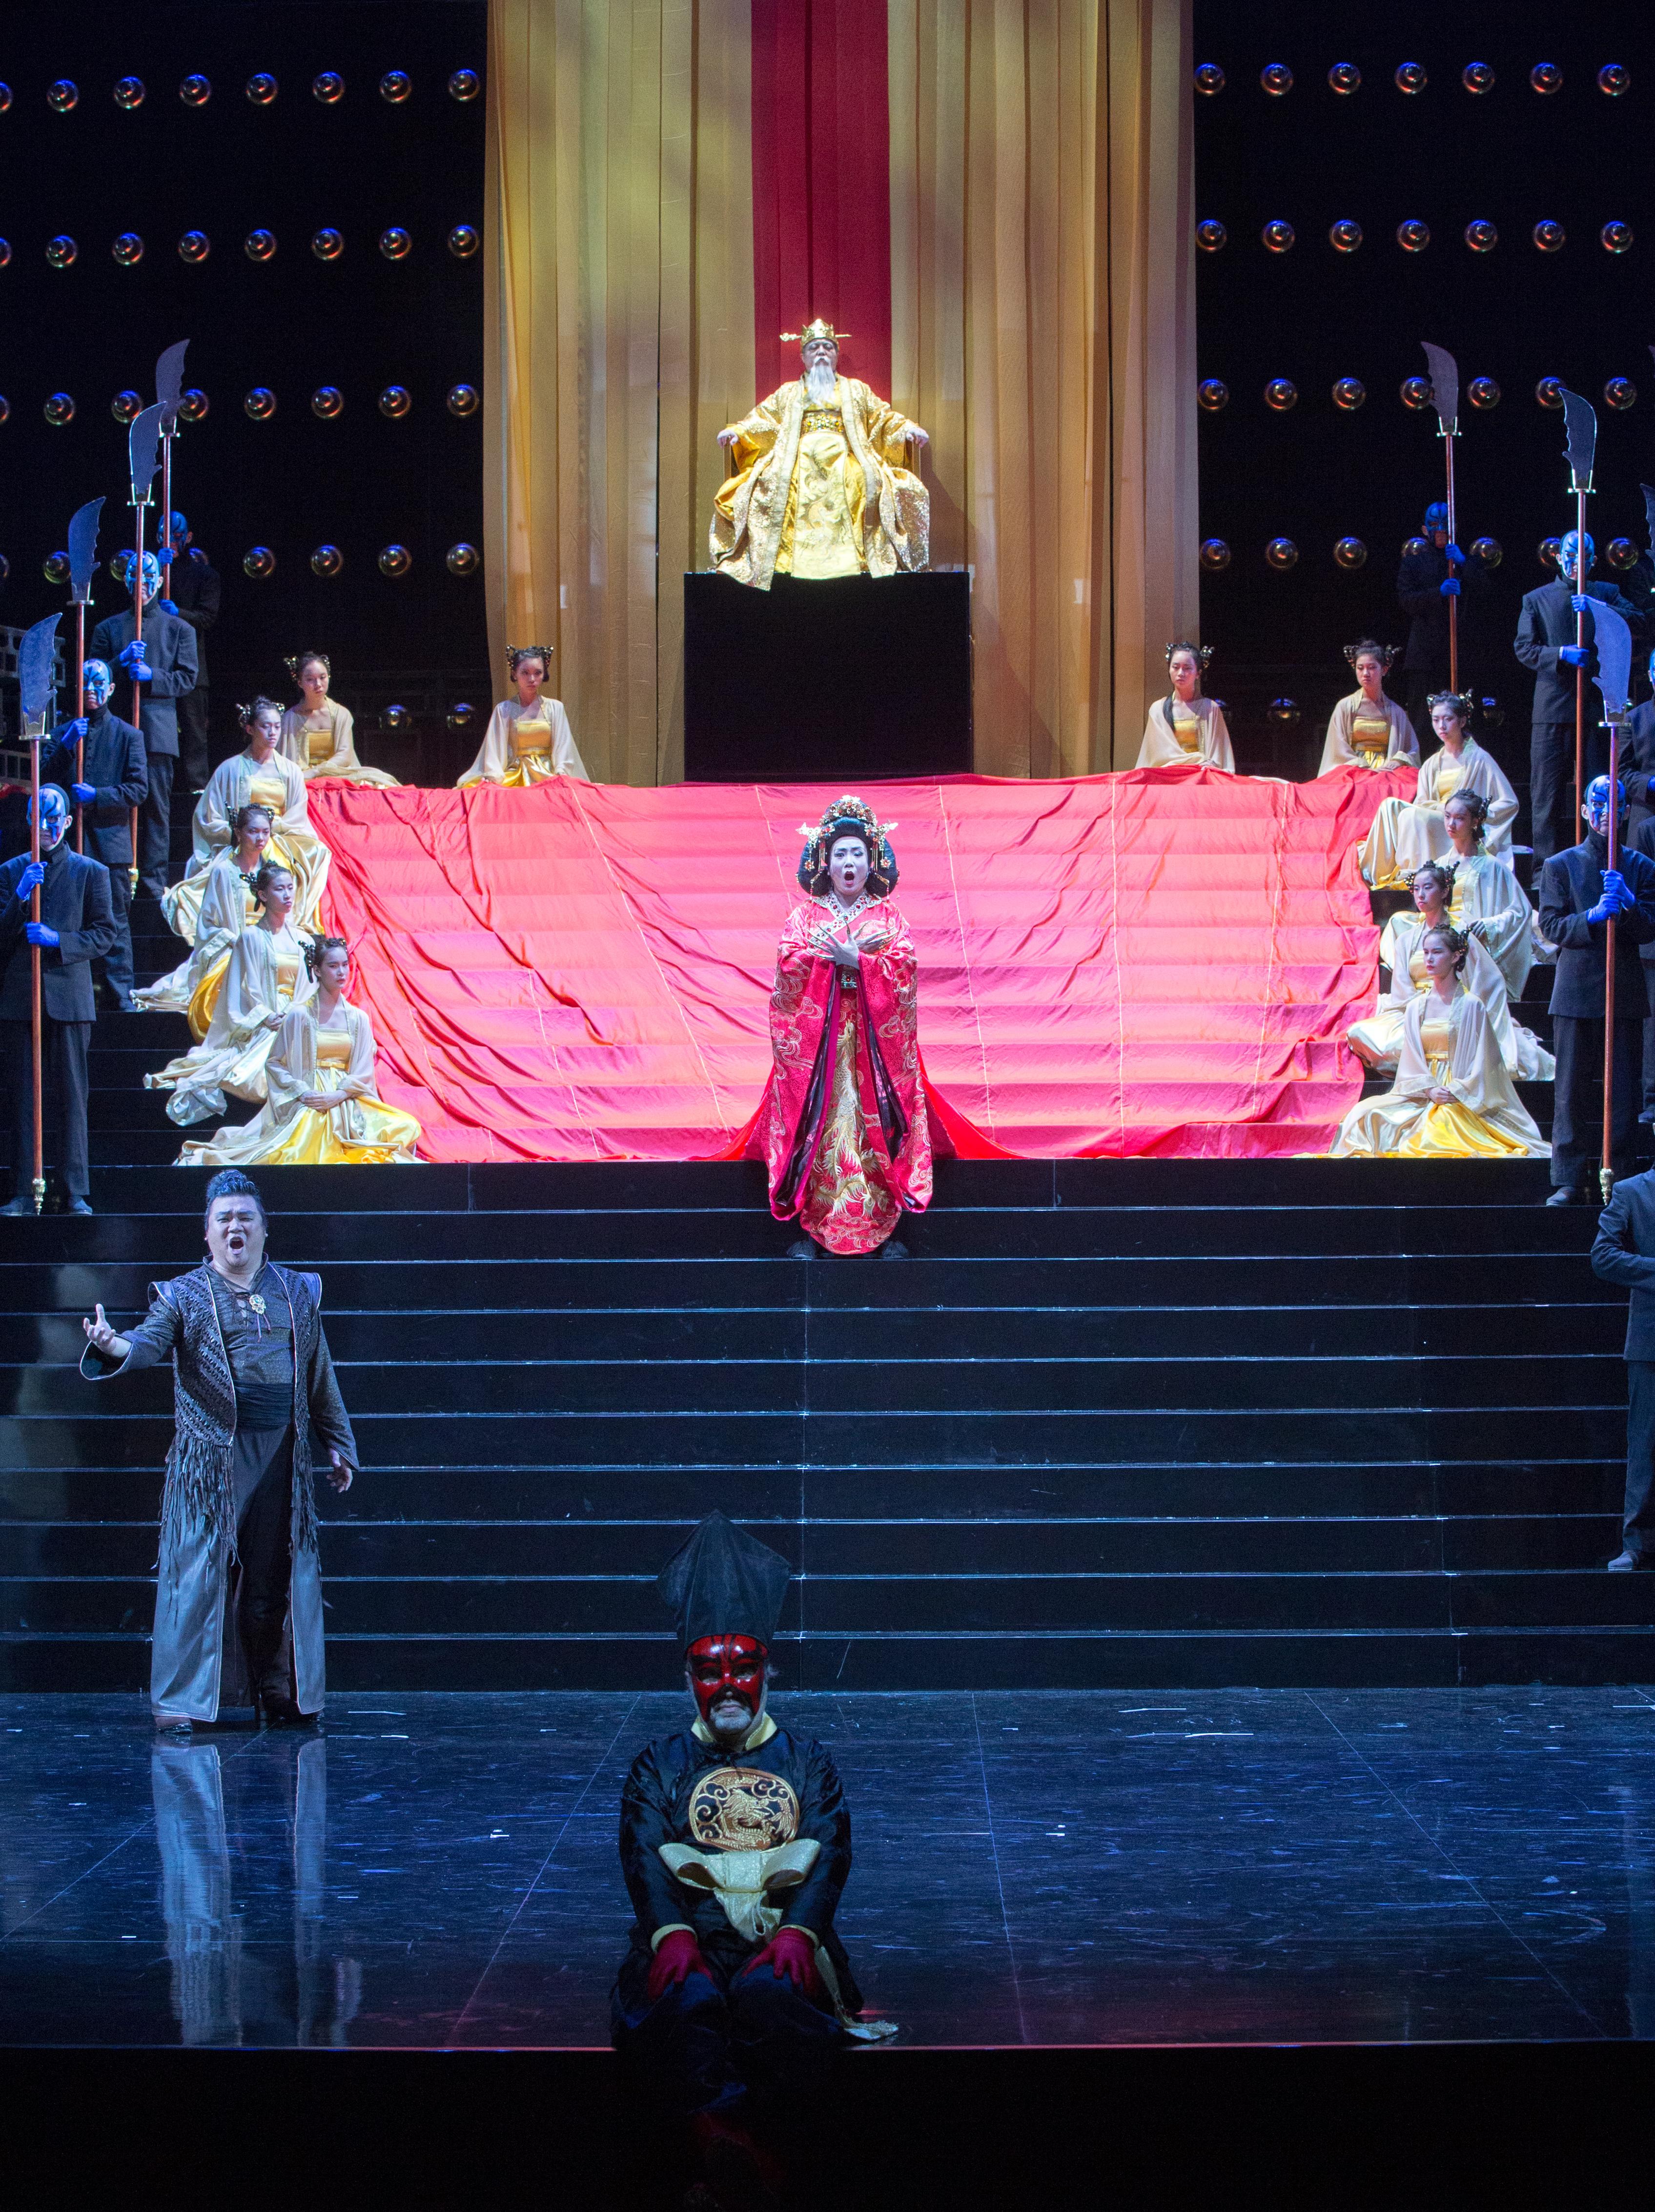 Turandot_Macao_37